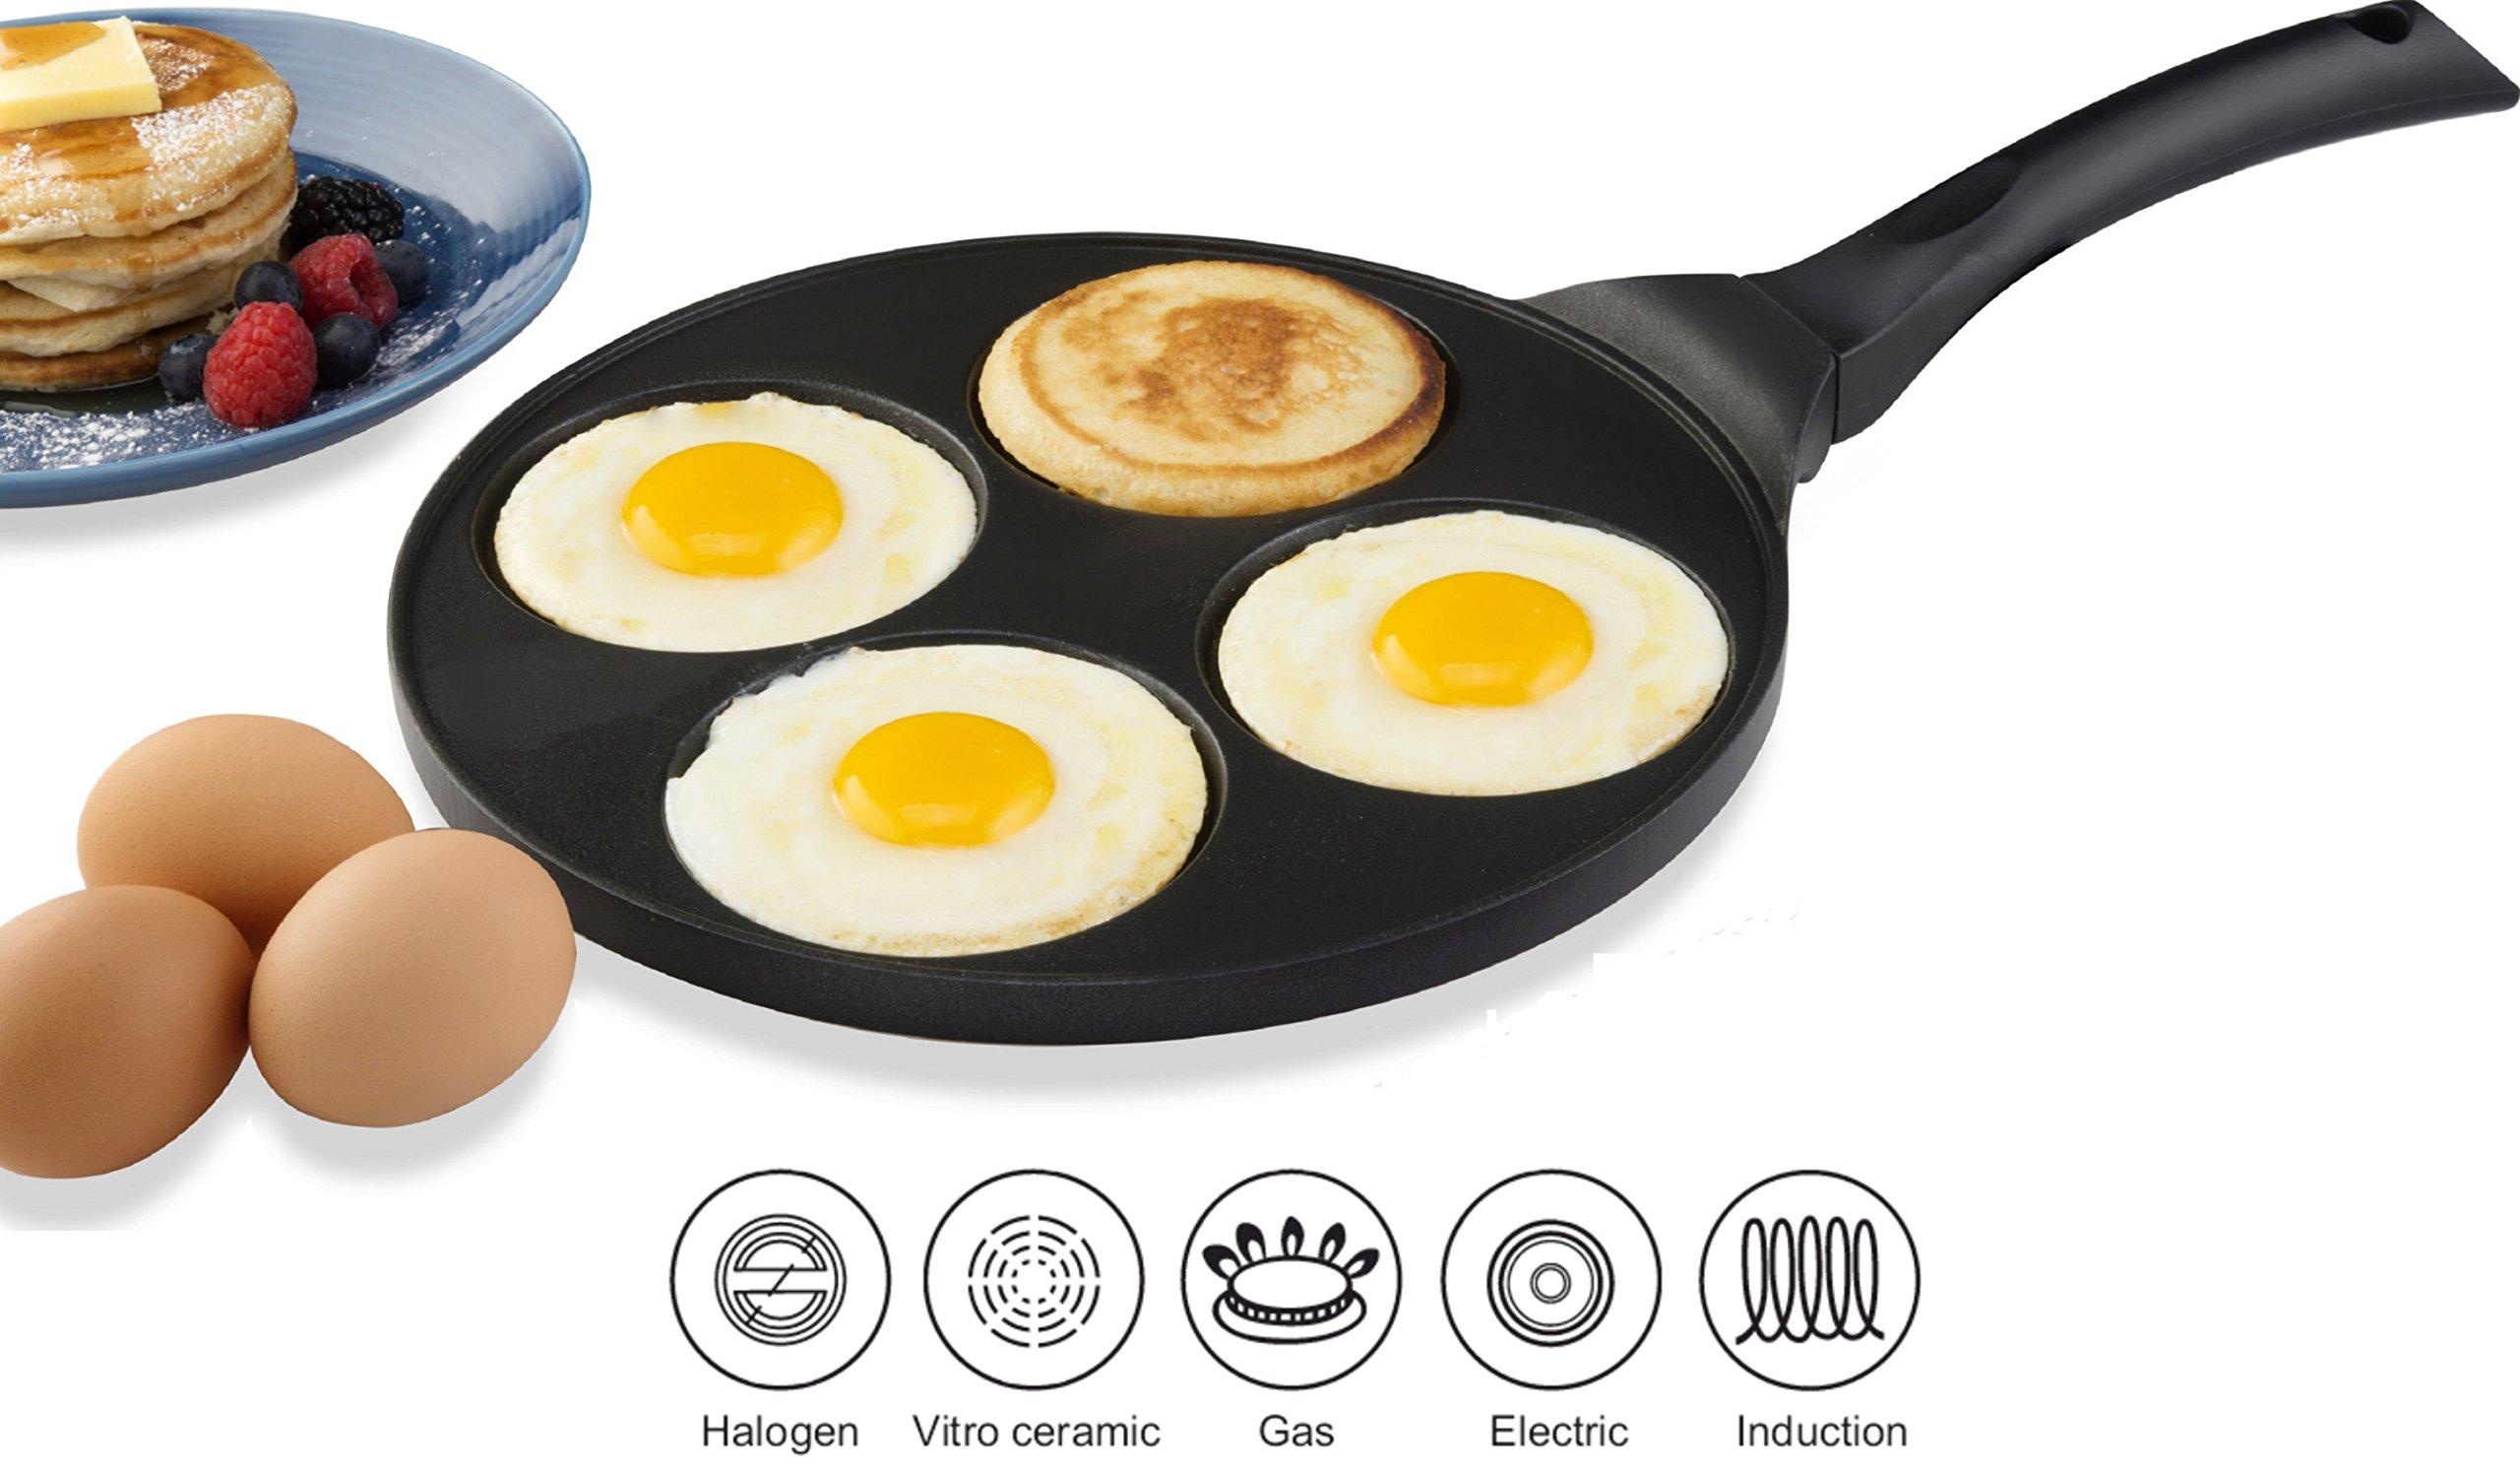 Gourmia GPA9525 Blini Pan With Induction Bottom Nonstick Silver Dollar Pancake Maker With 4-Mold Design 100% PFOA free non-stick coating